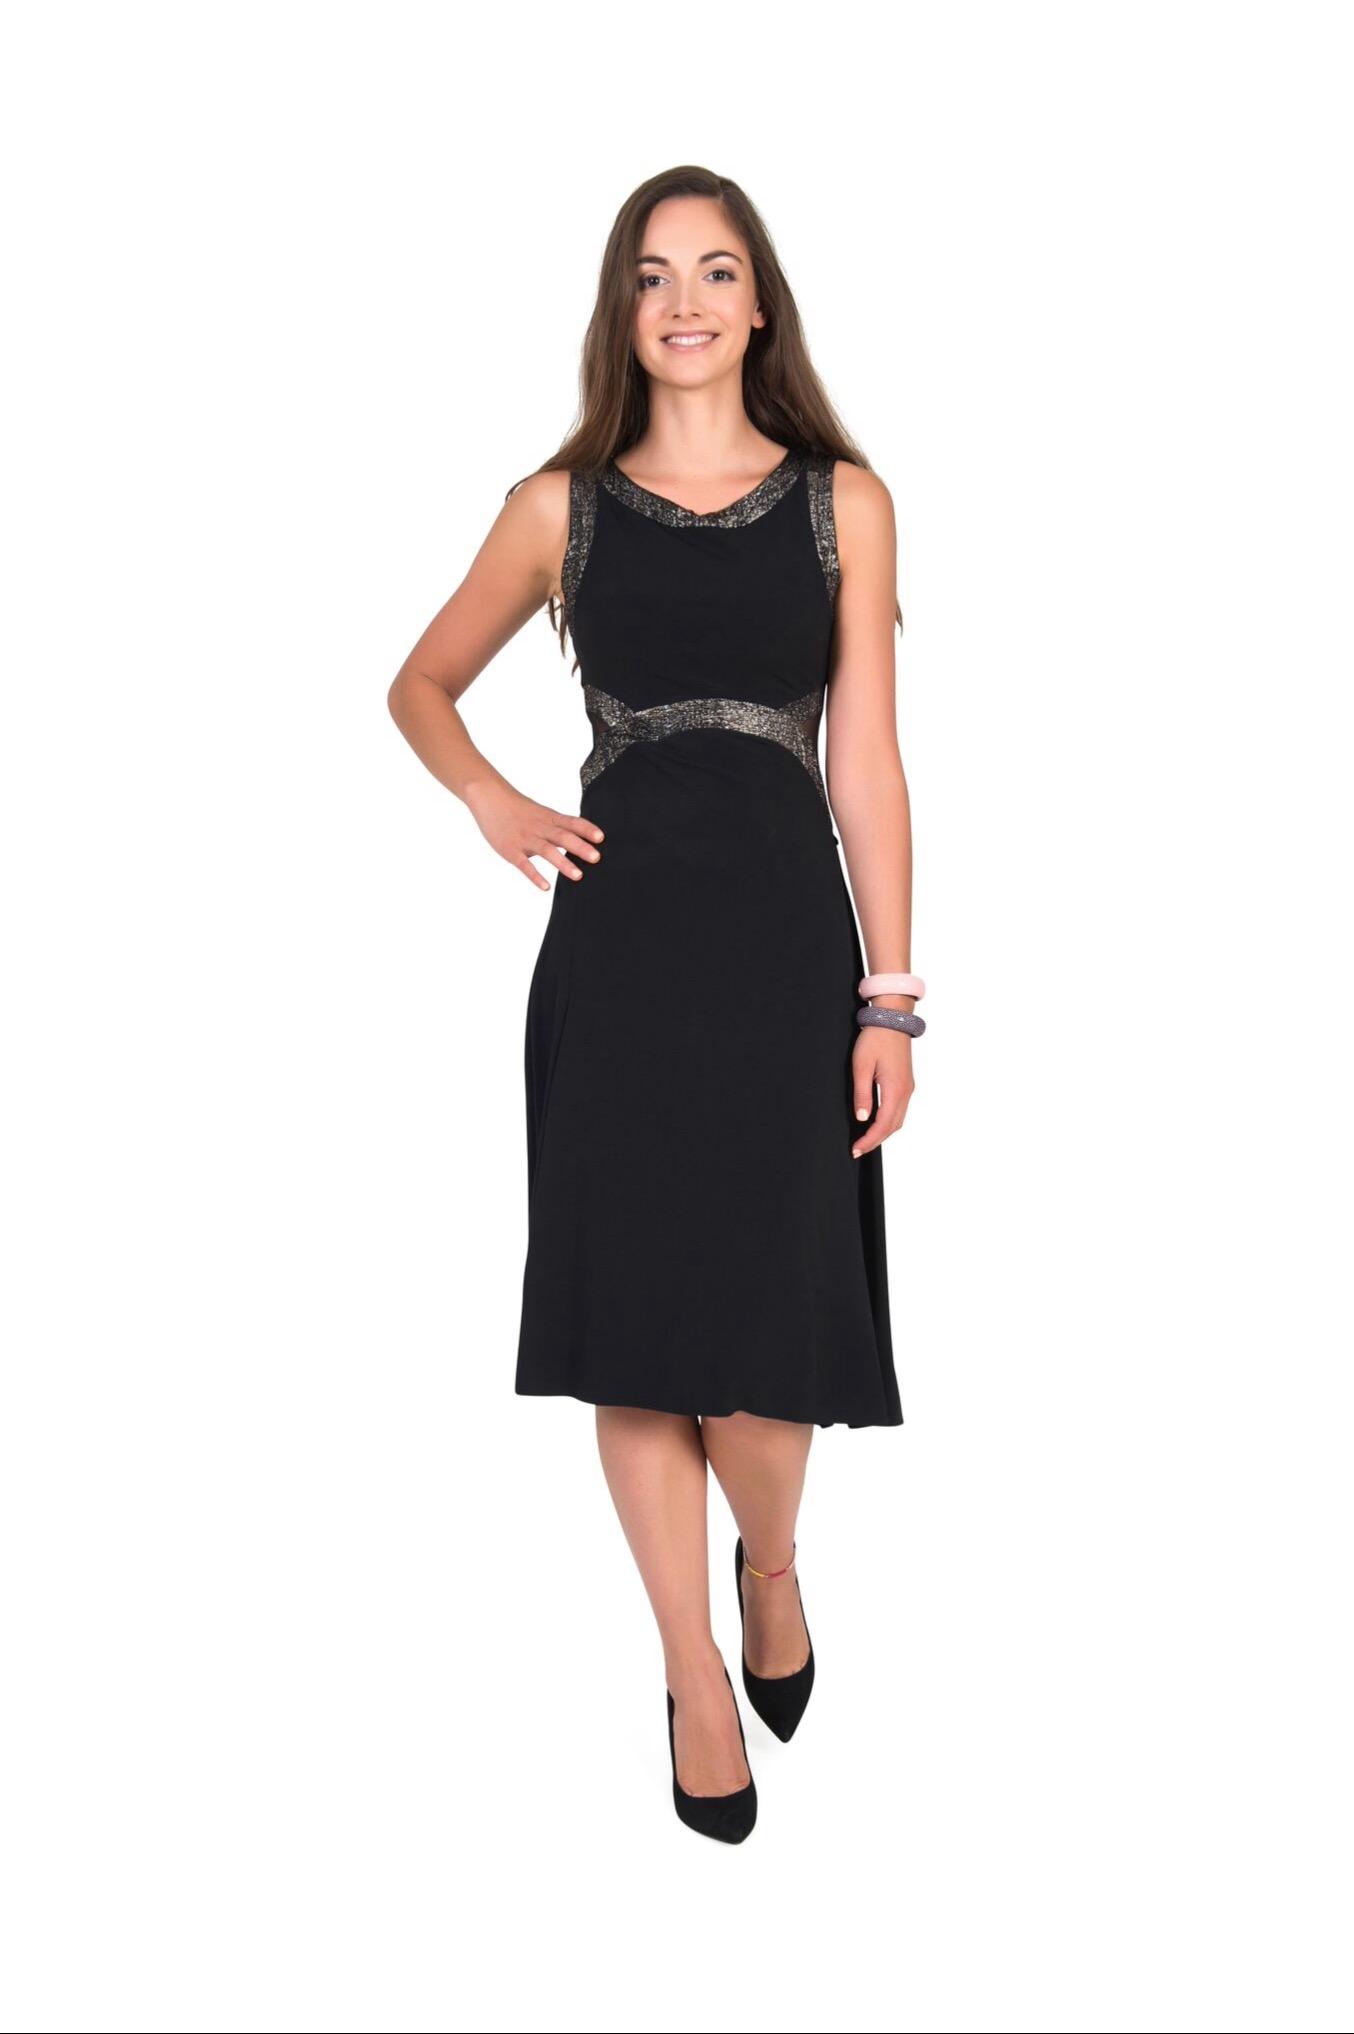 A front view of an elegant black Tango dress